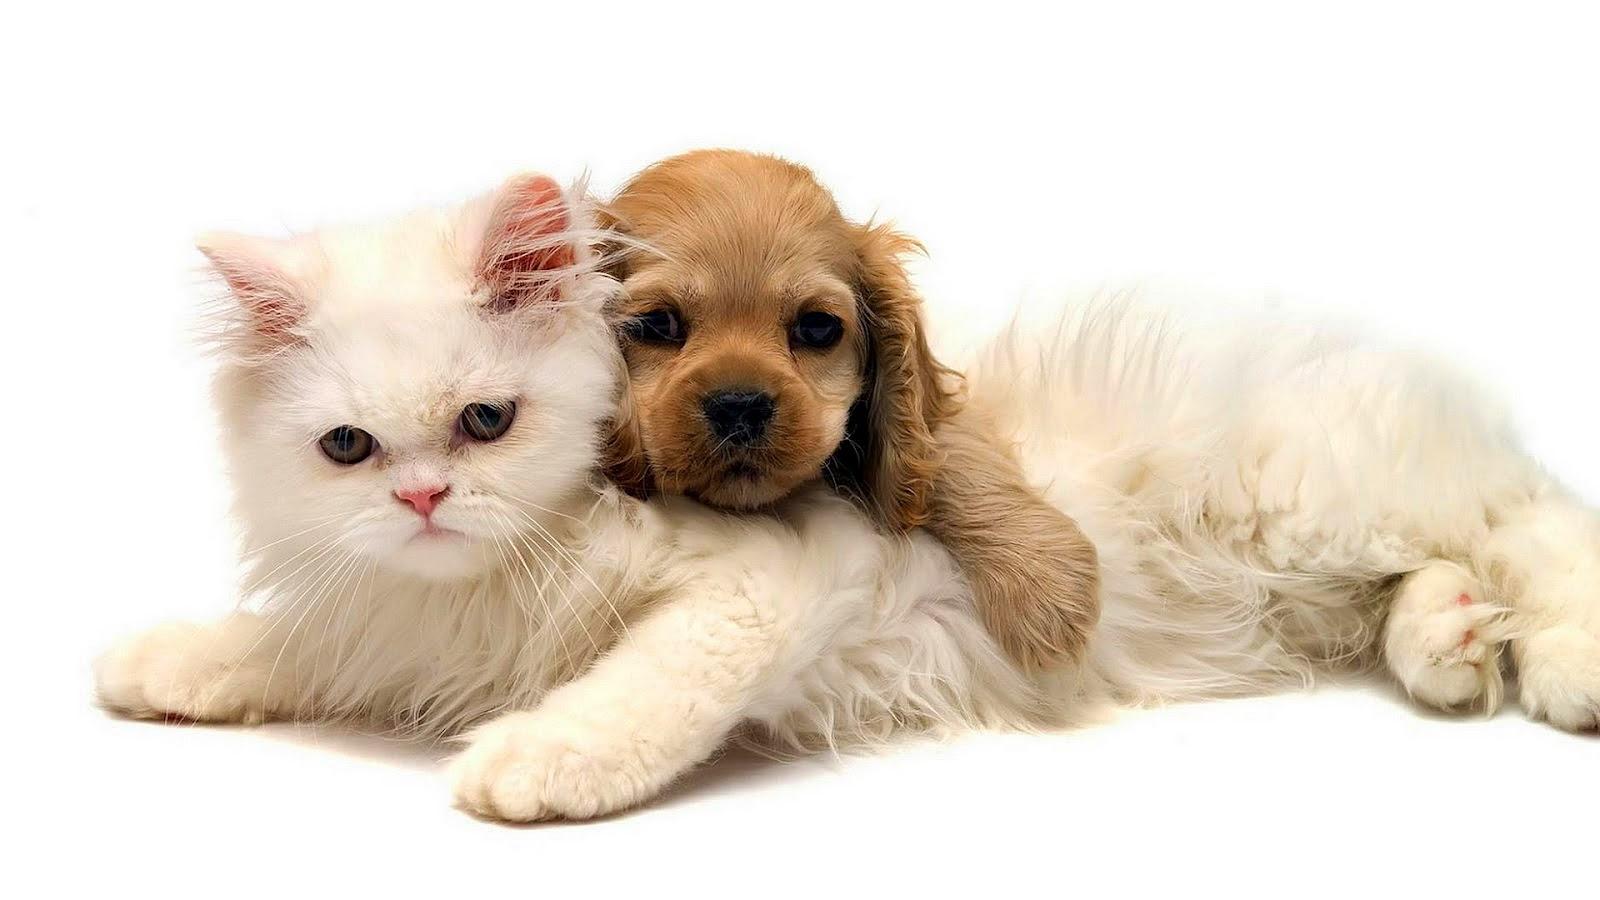 Kittens And Puppies Wallpaper Desktop